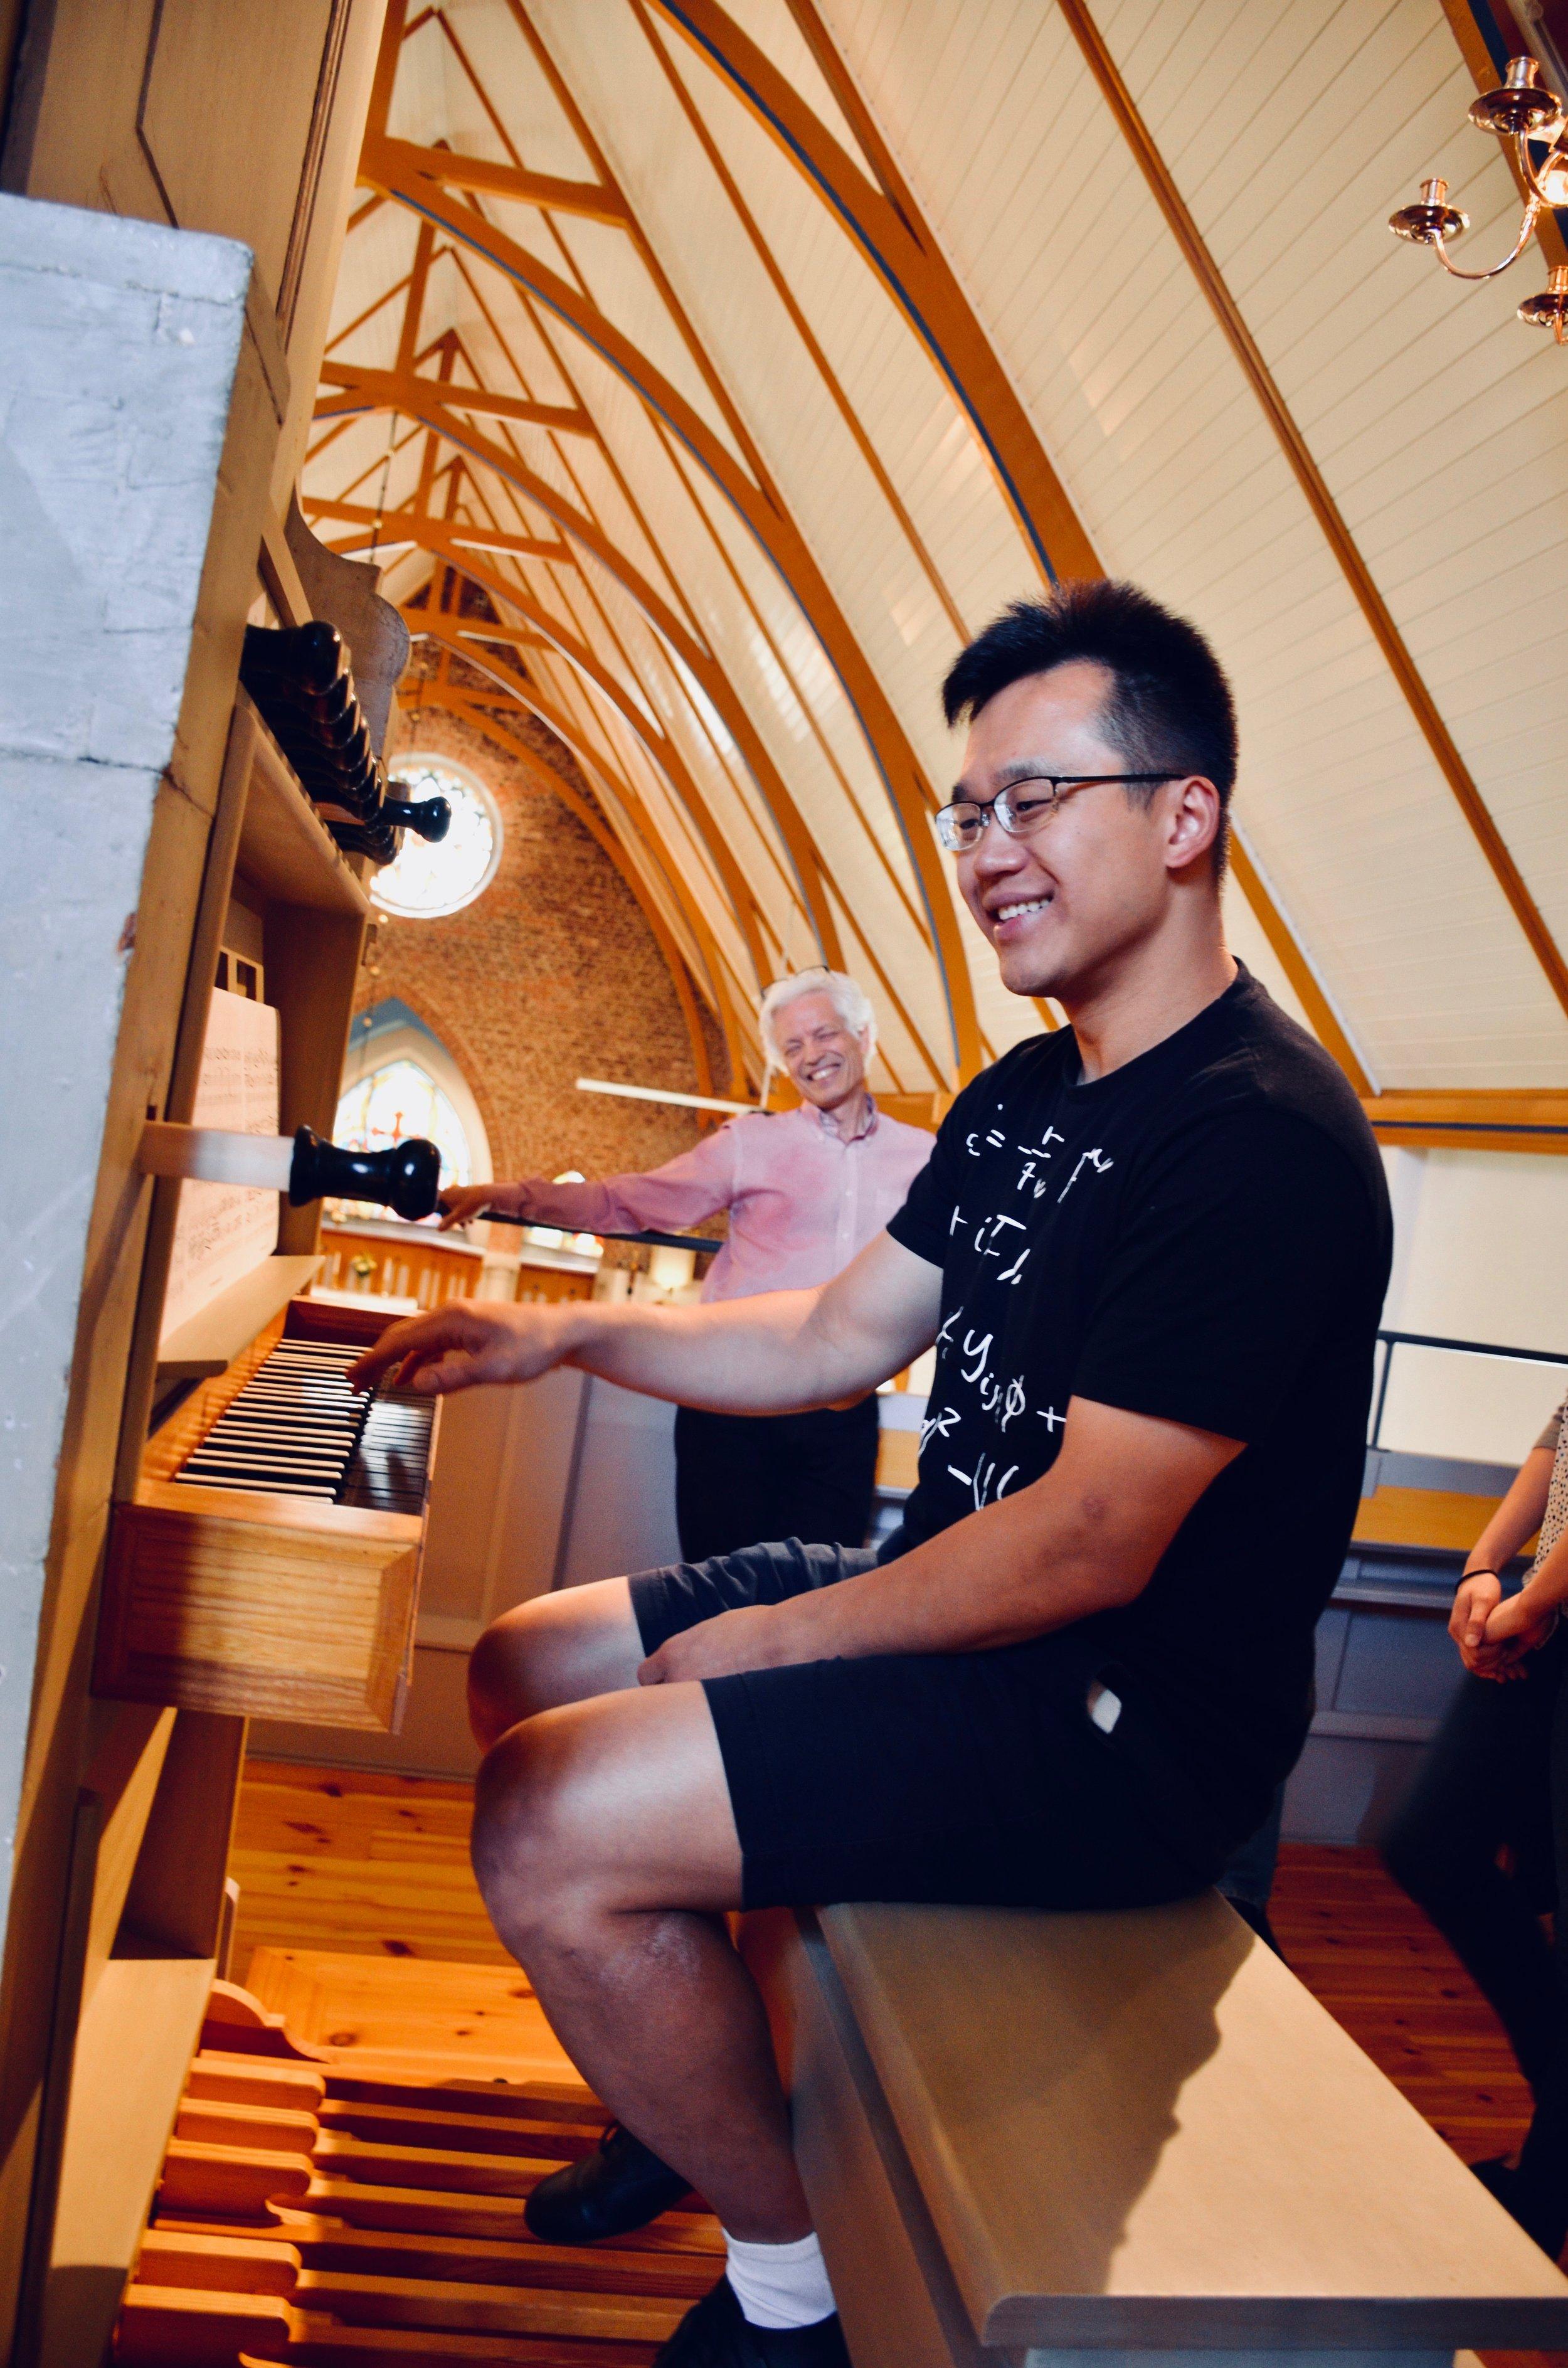 Hans Davidsson coaches Adrian Cho on the 1783 Schiörlin organ in Jonsered, Sweden.